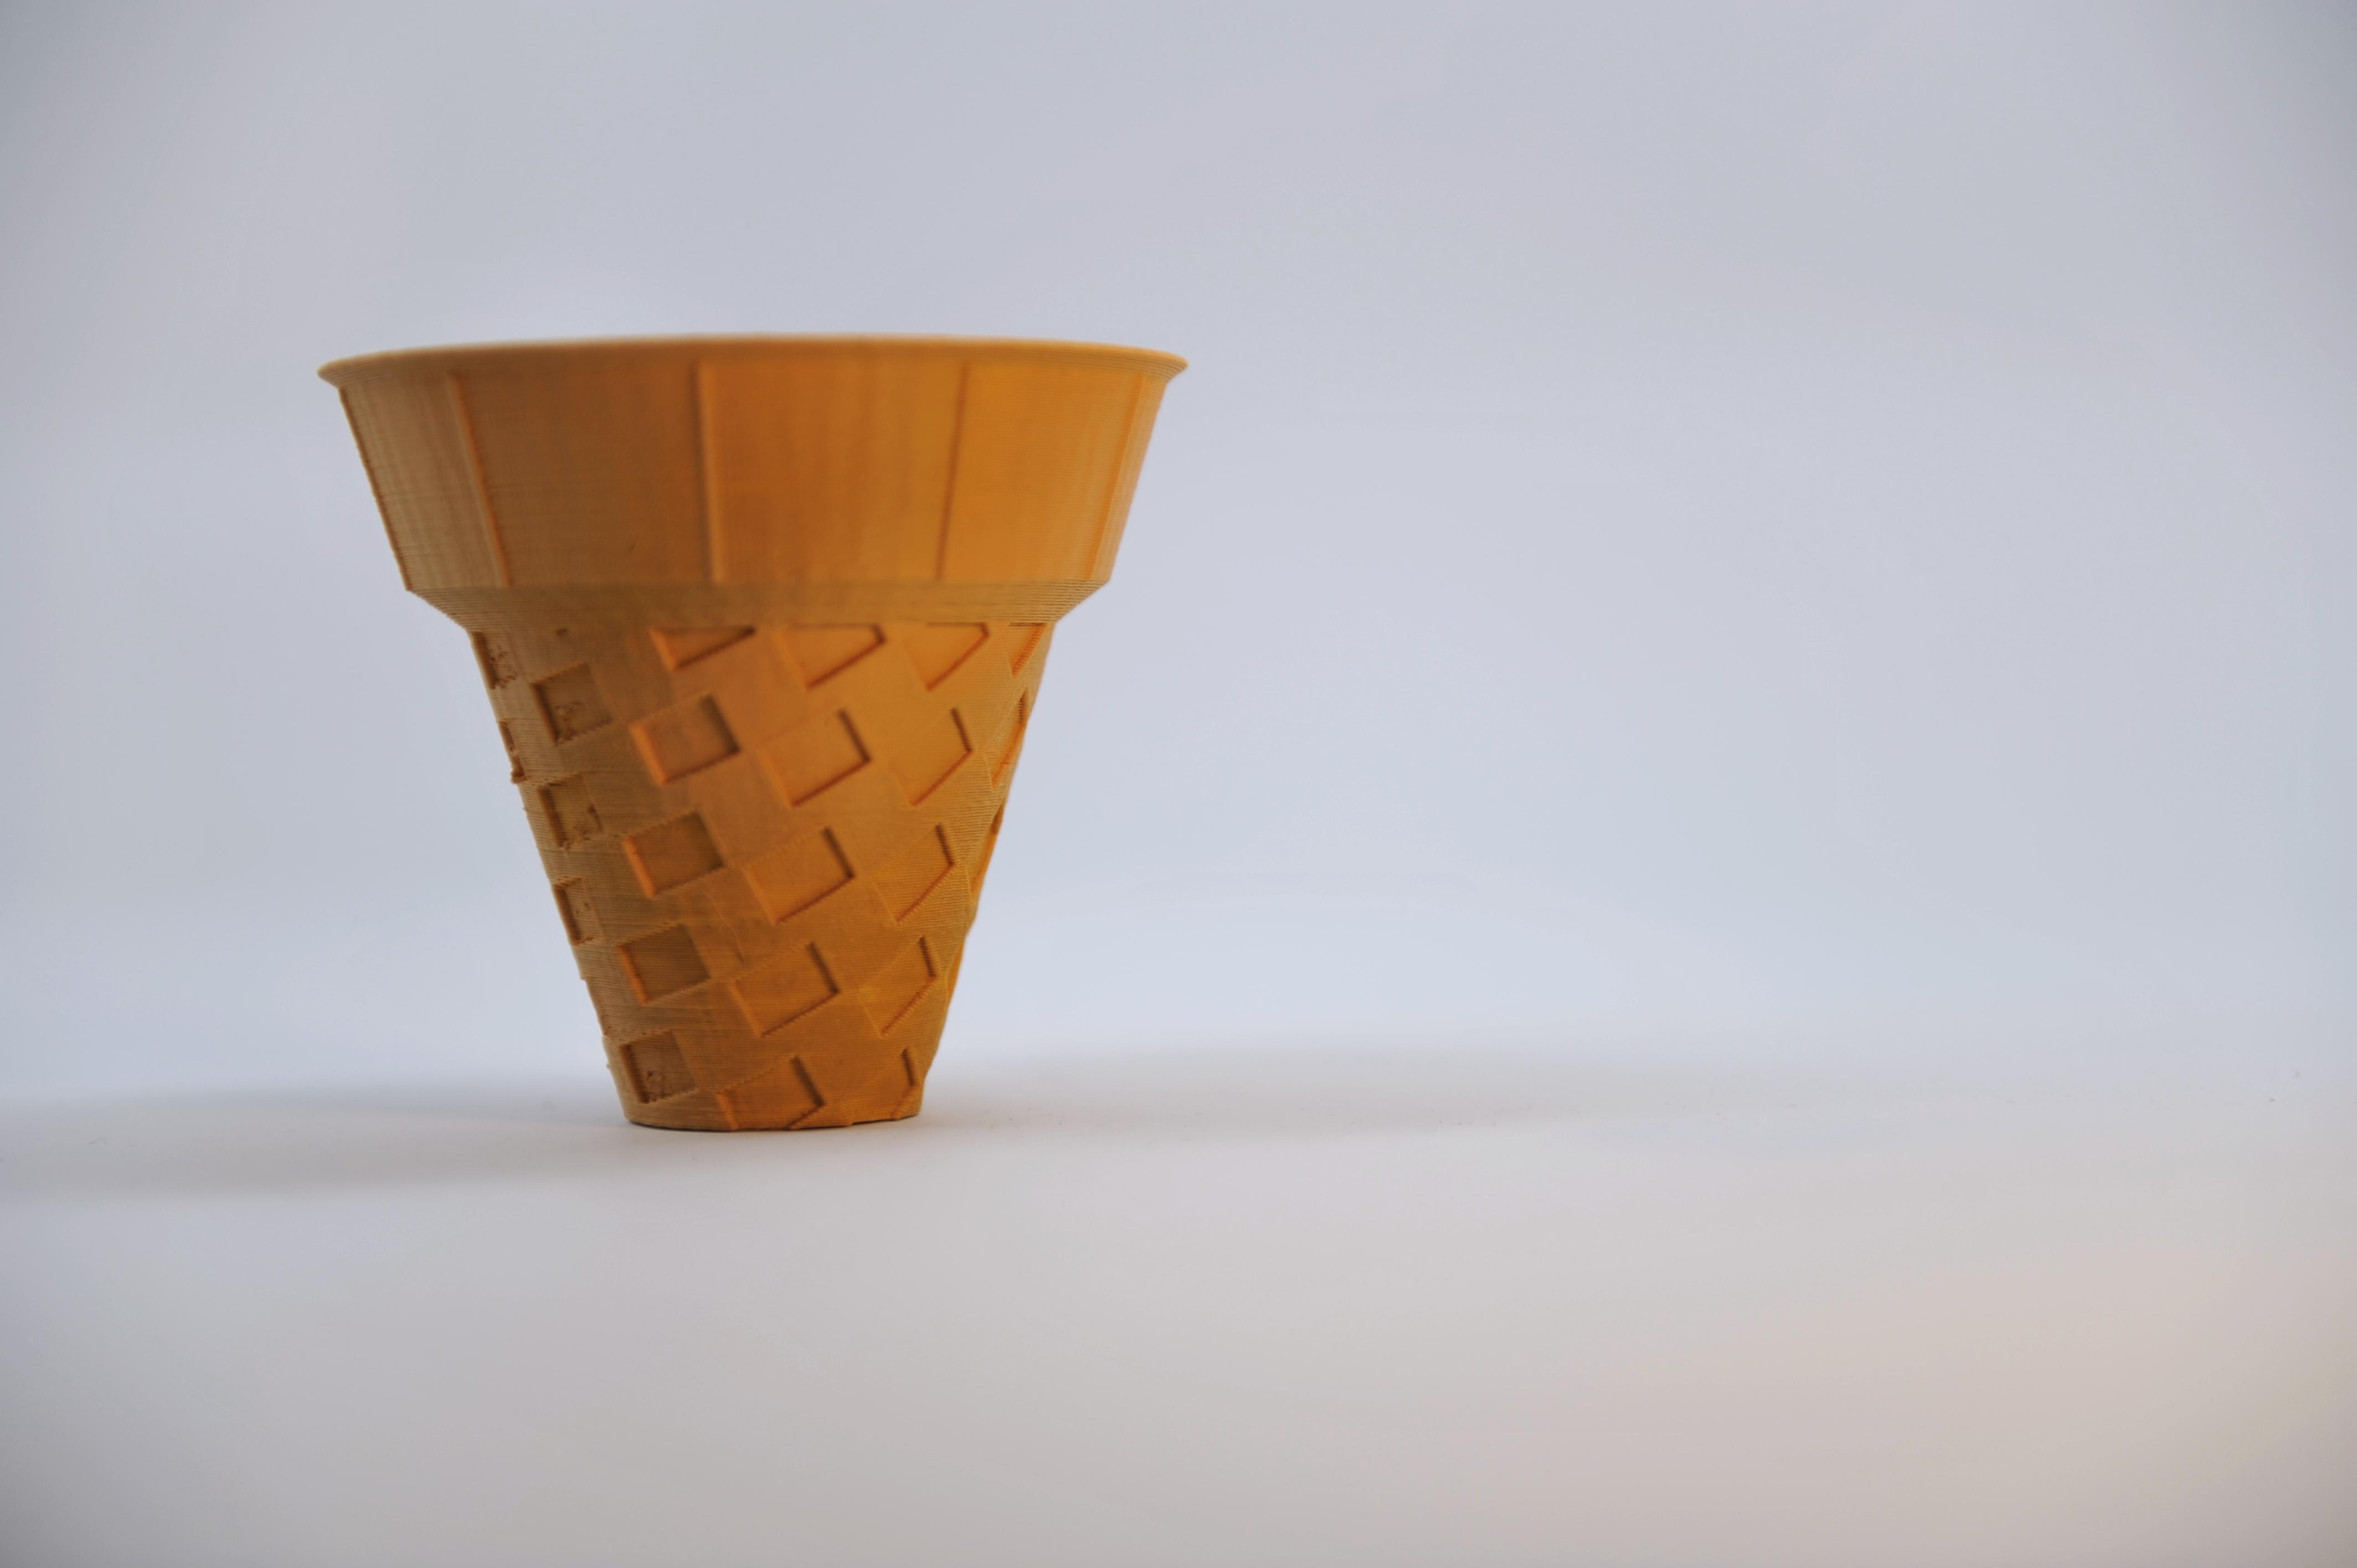 3d Printed Ice Cream Bai